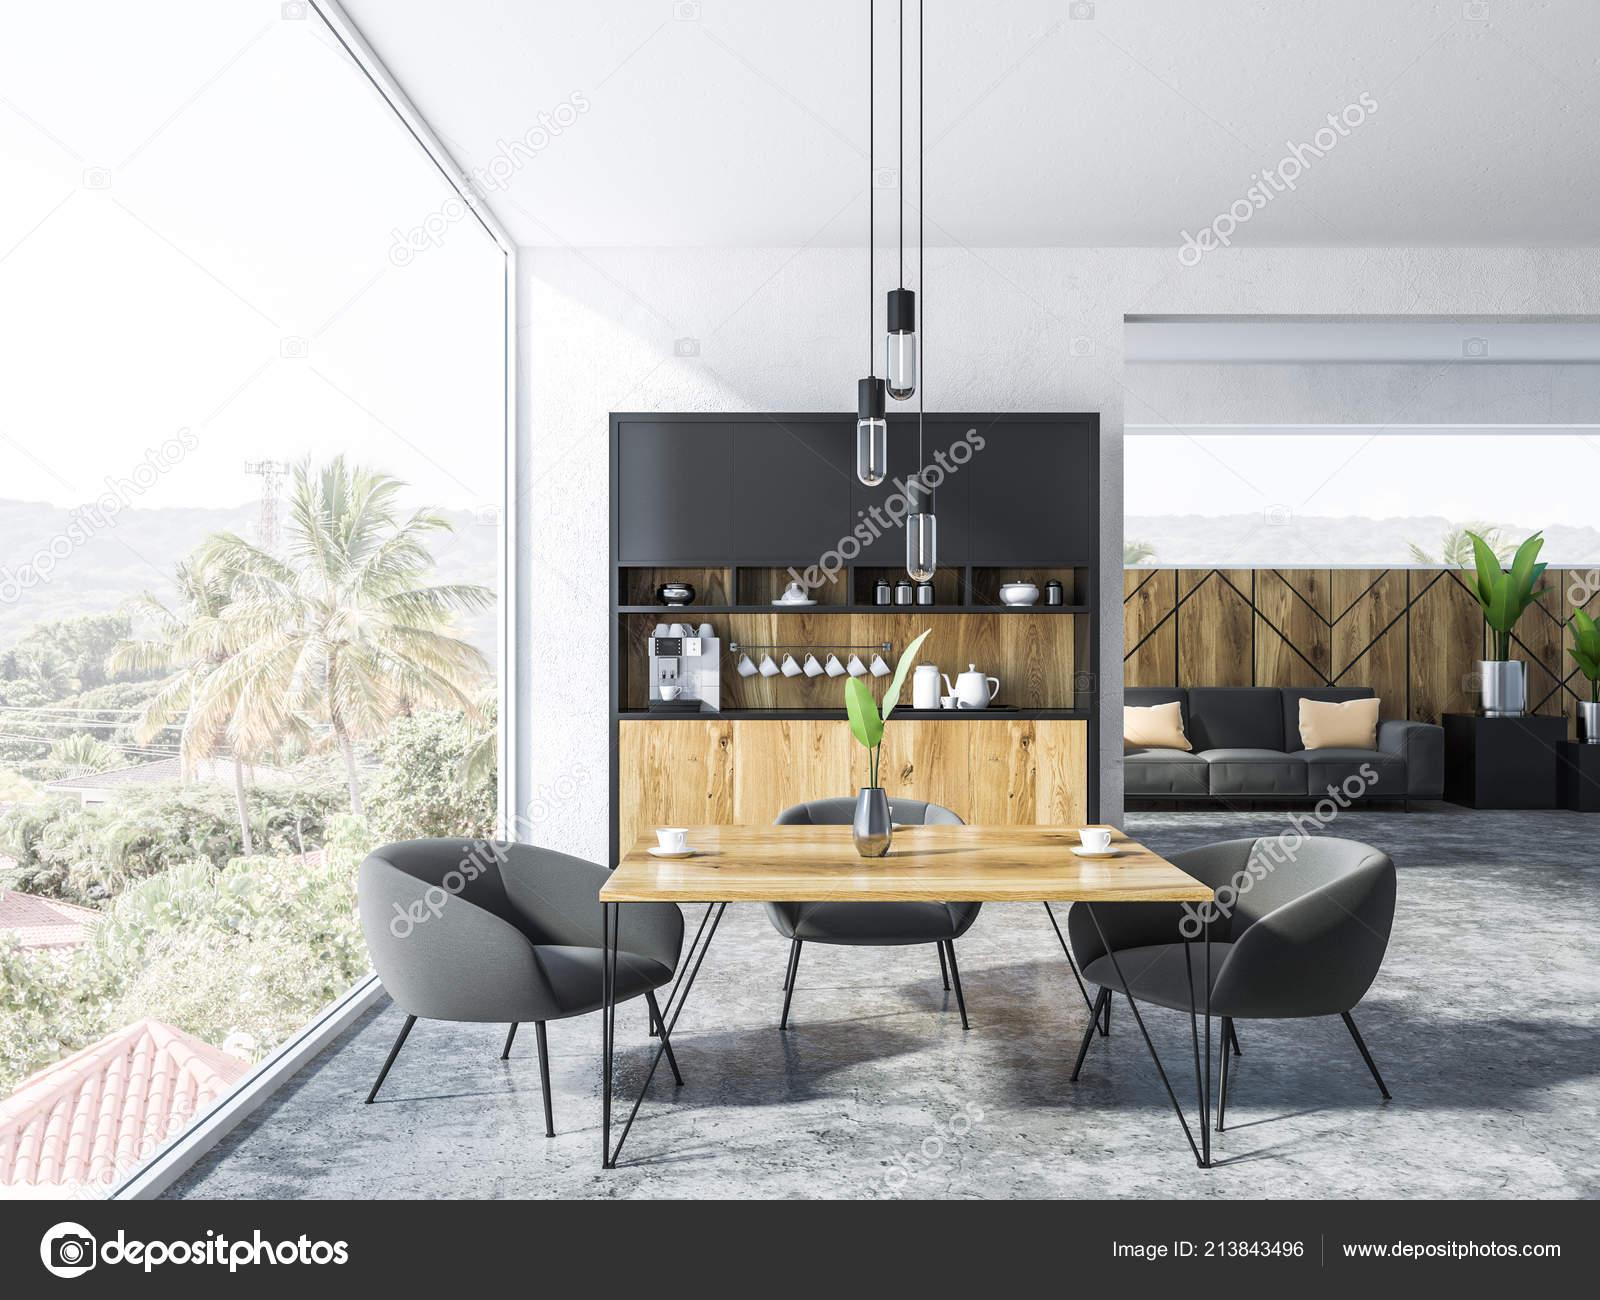 Picture of: Interior Studio Apartment Kitchen Corner Square Table Gray Armchairs Sofa Stock Photo C Denisismagilov 213843496